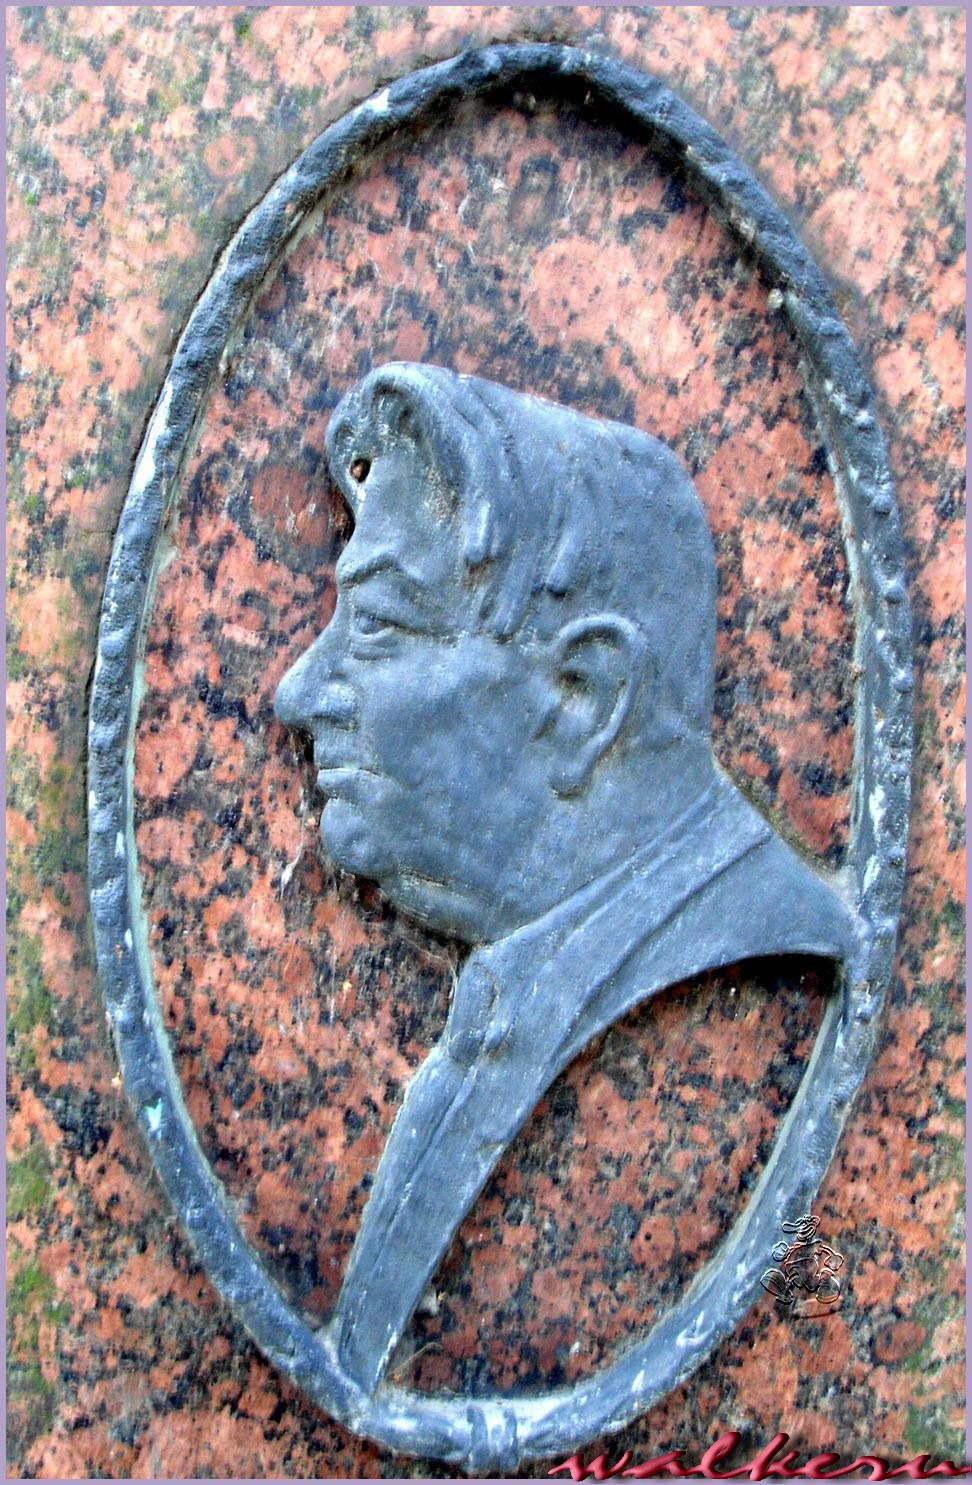 Могила Исакова П.И. на Большеохтинском кладбище